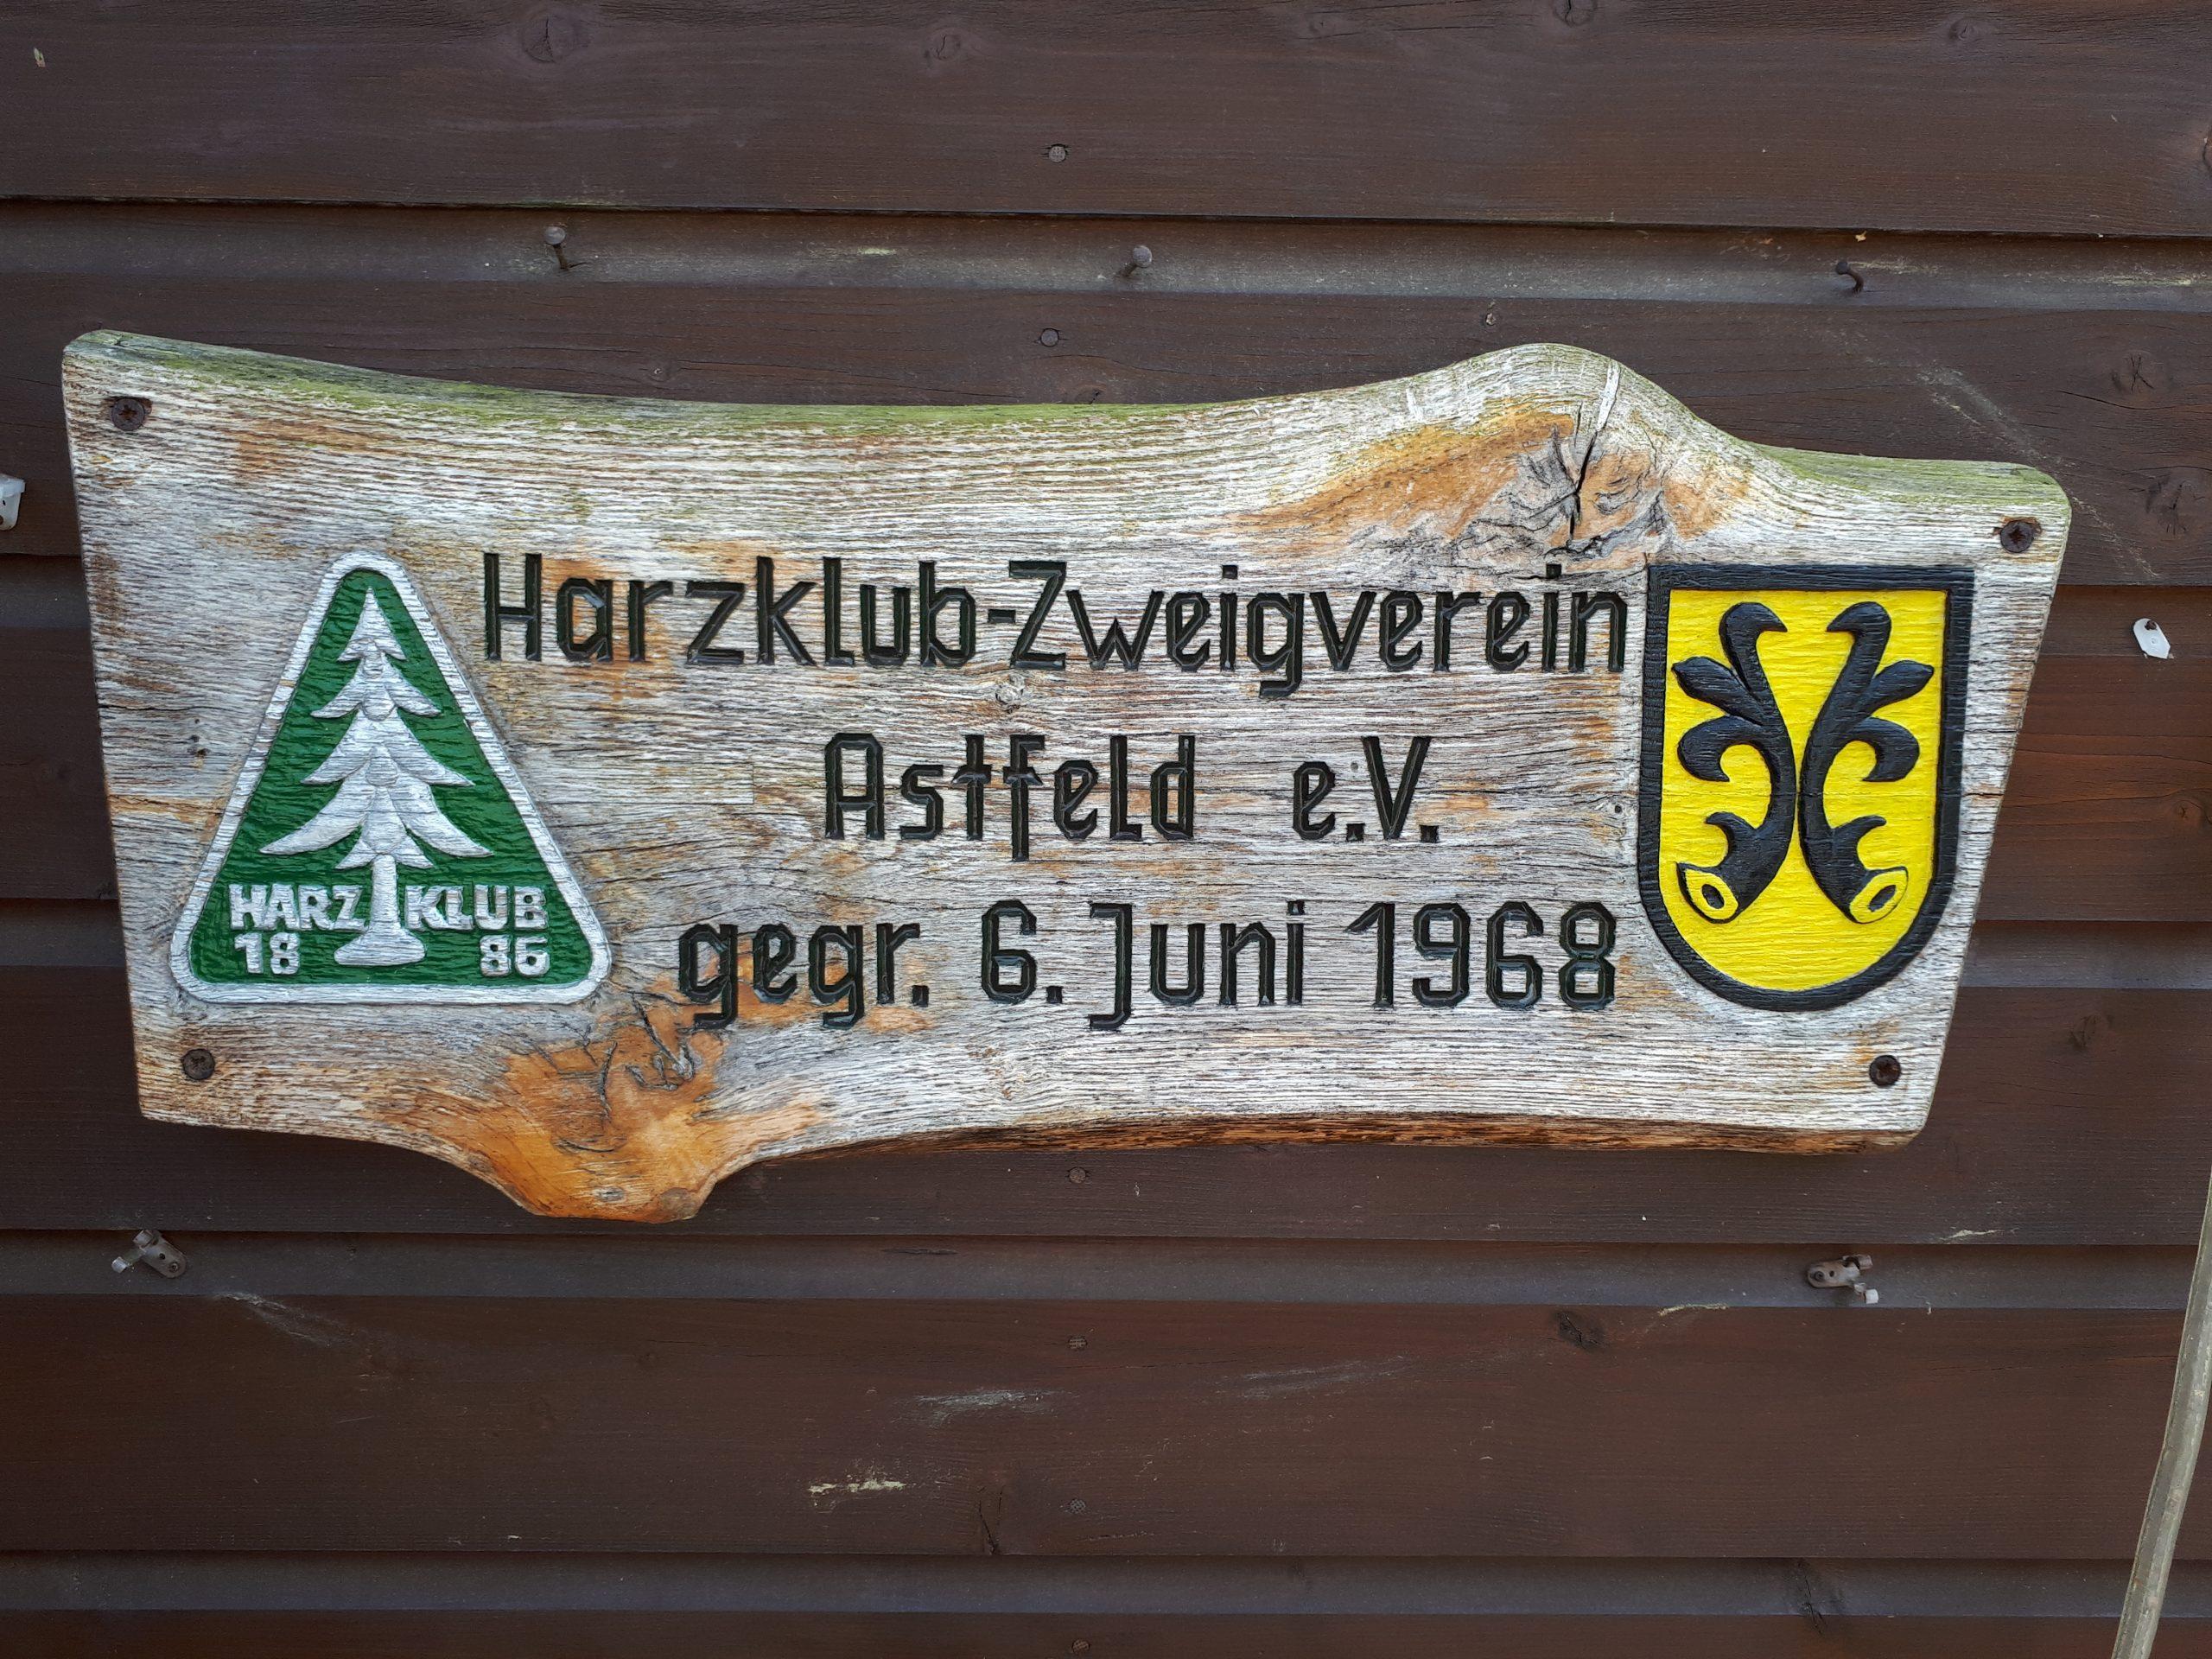 Harzklub Astfeld